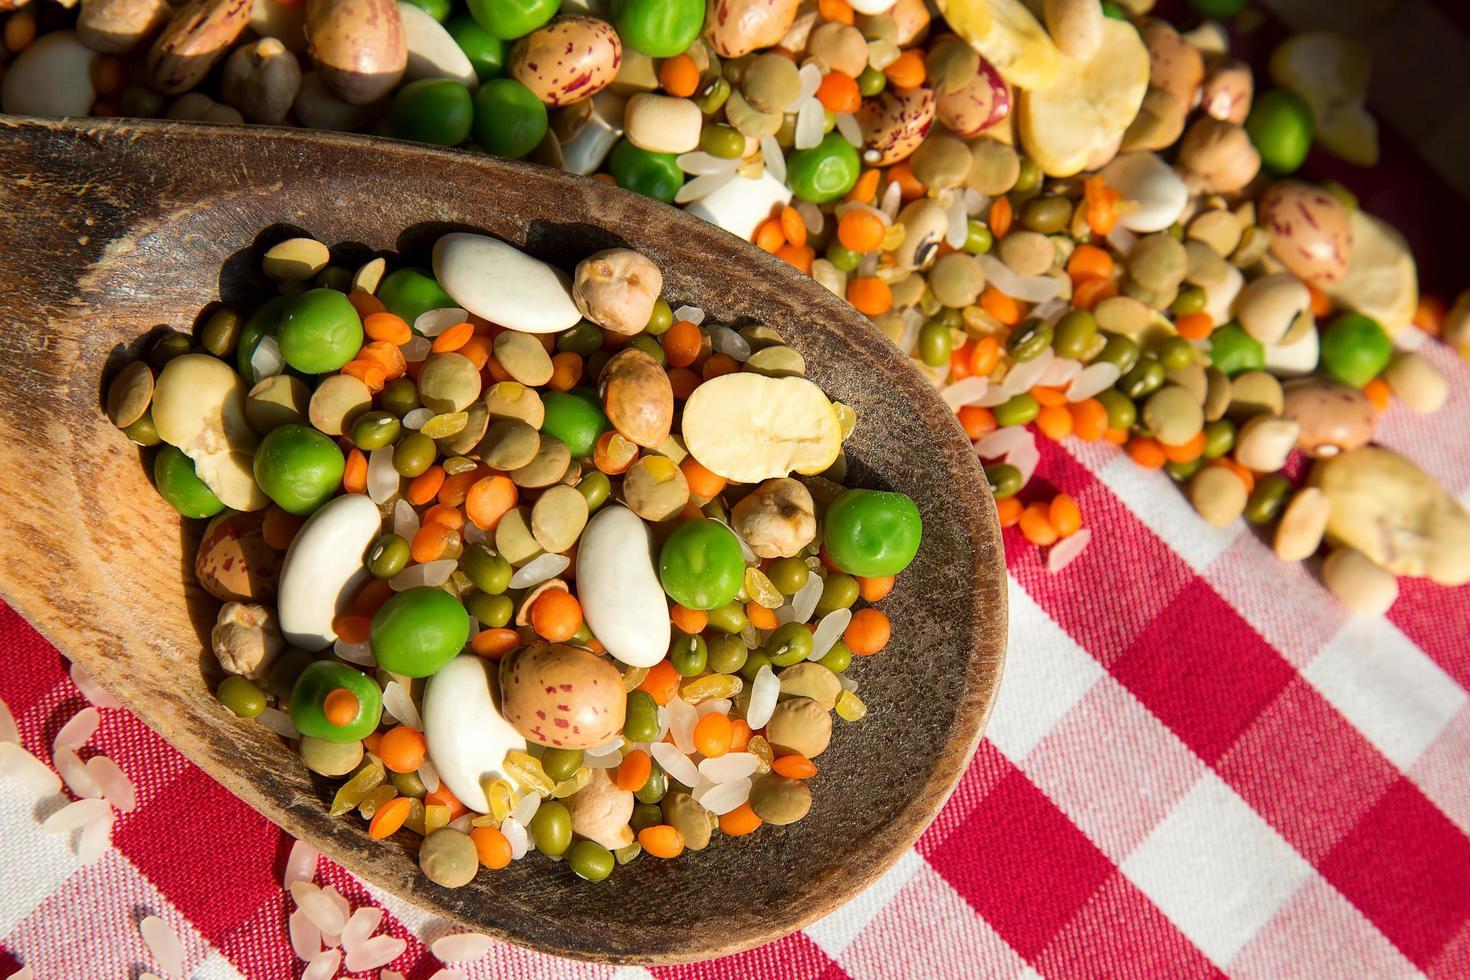 Healthy Vegetarian Raw Food Legumes photo